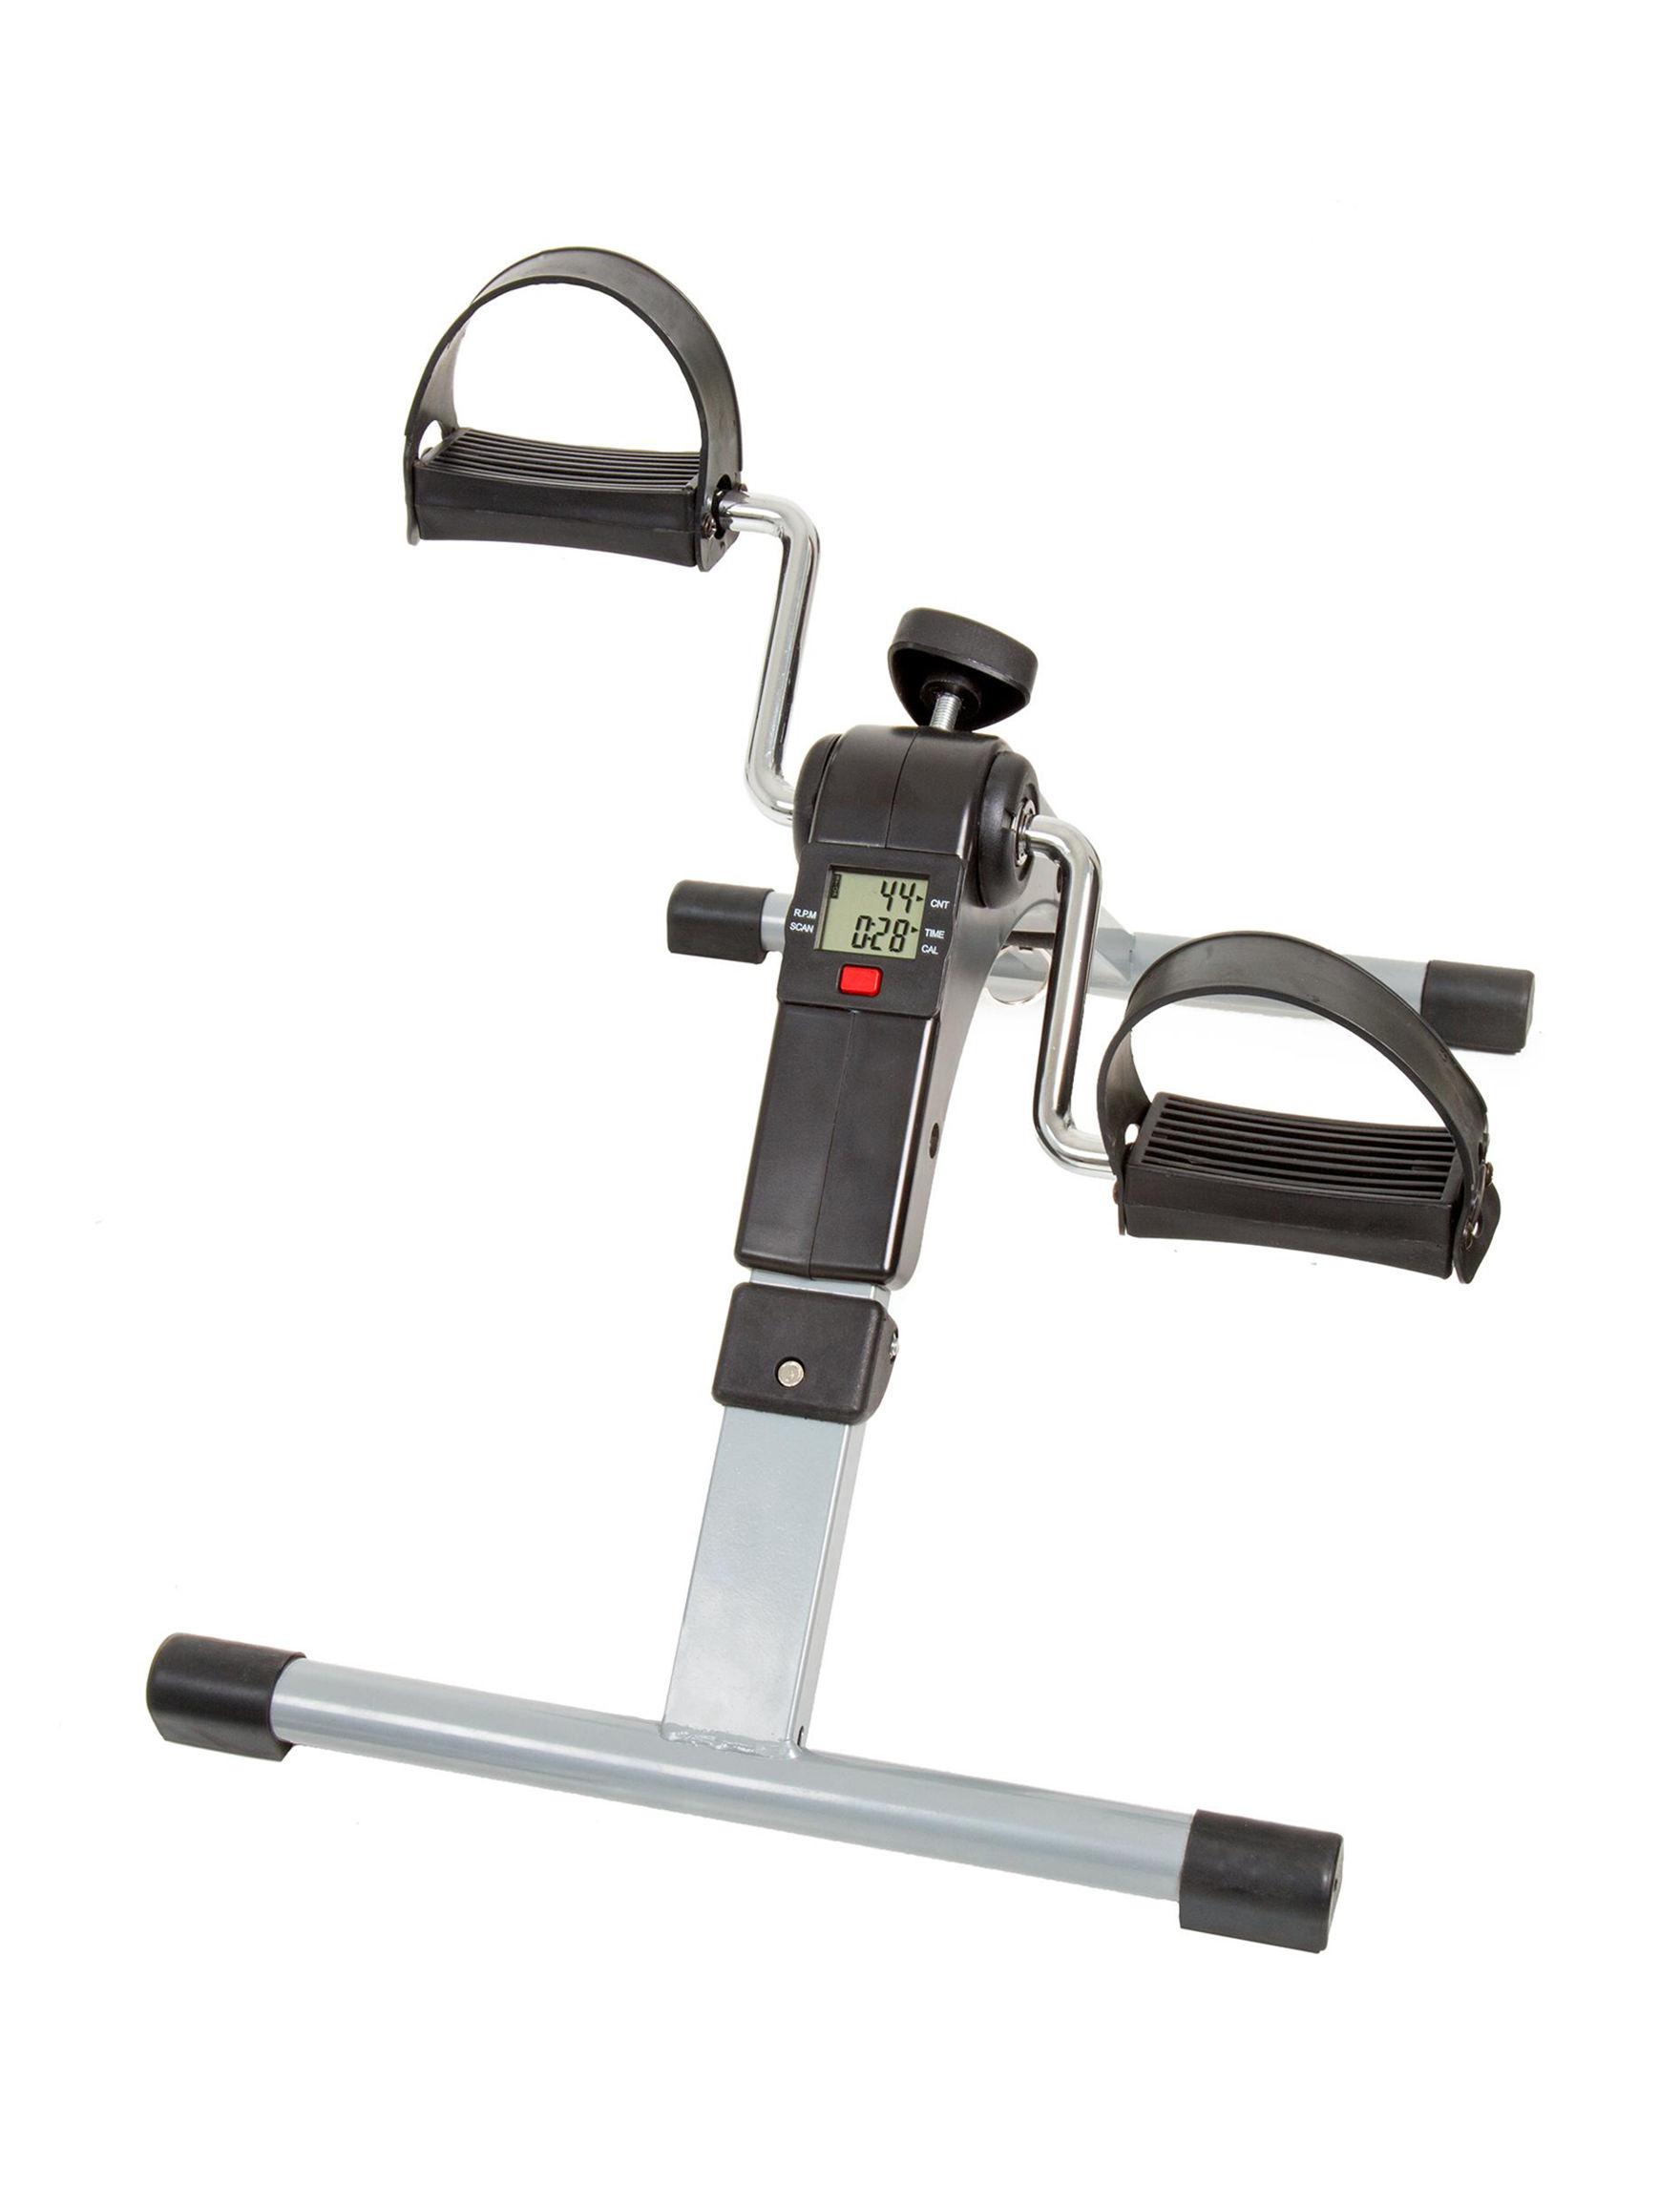 Wakeman Silver Accessories Fitness Equipment